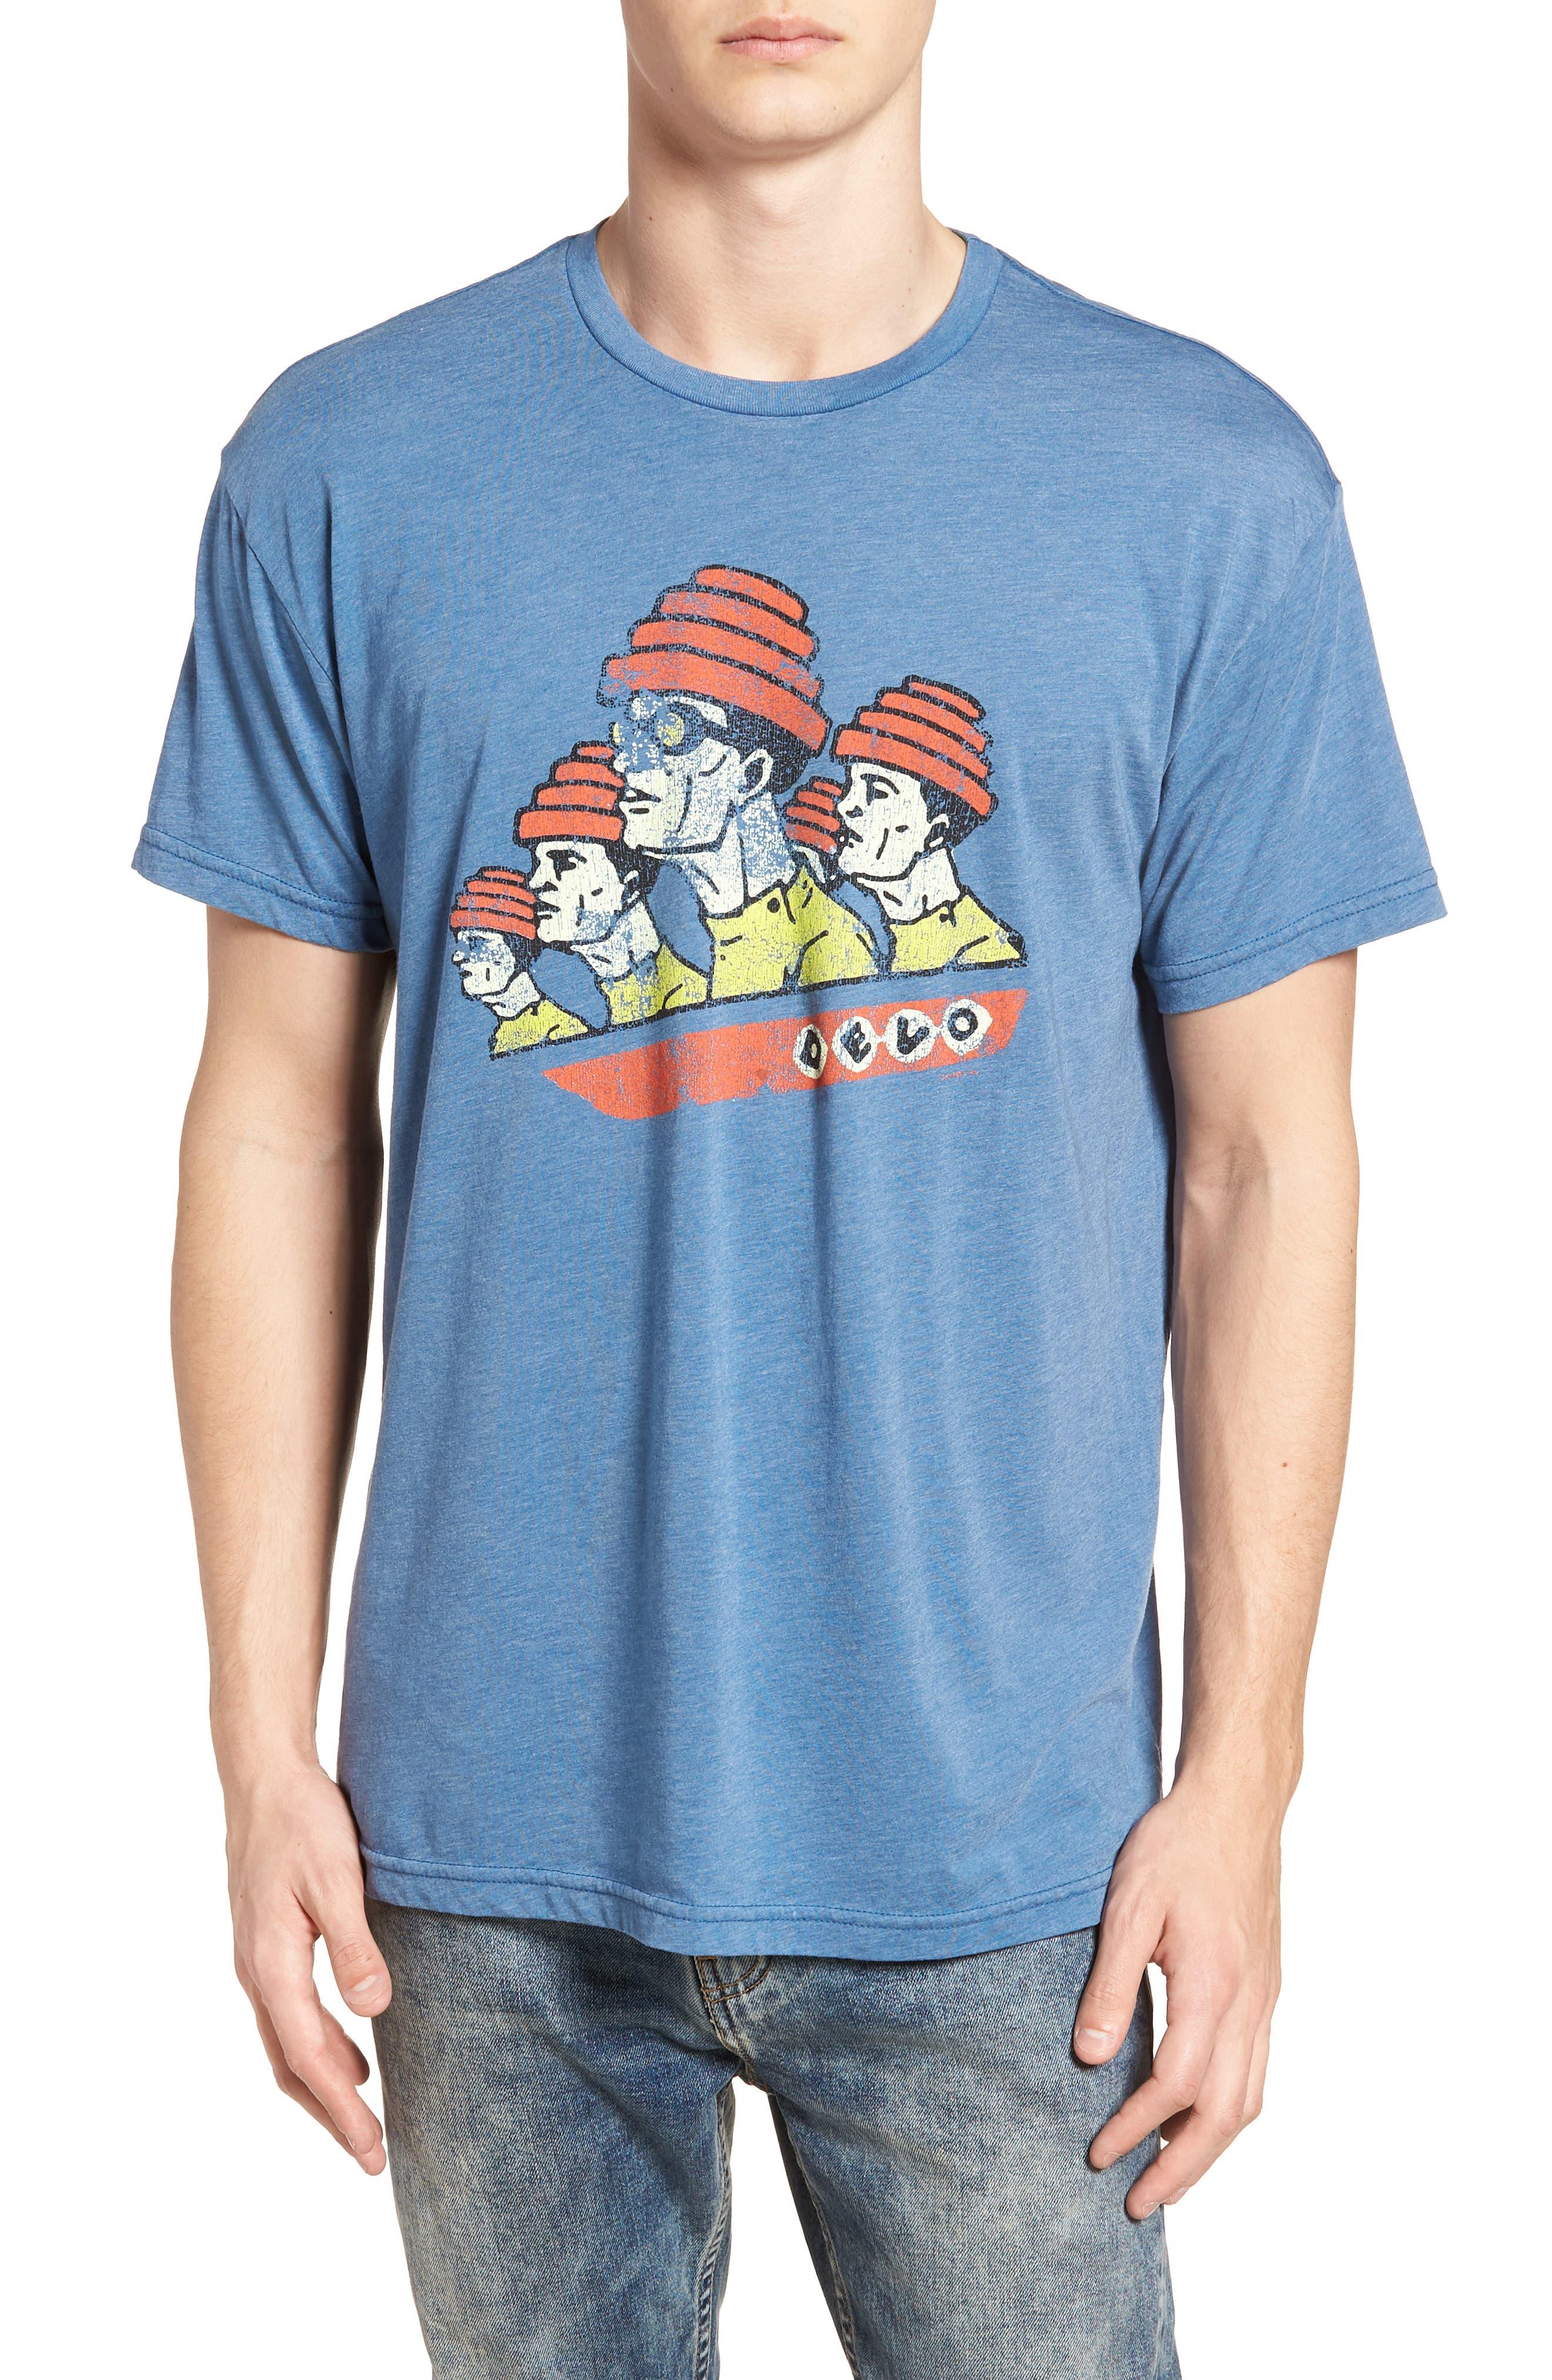 Devo Graphic T-Shirt,                         Main,                         color, Heather Blue